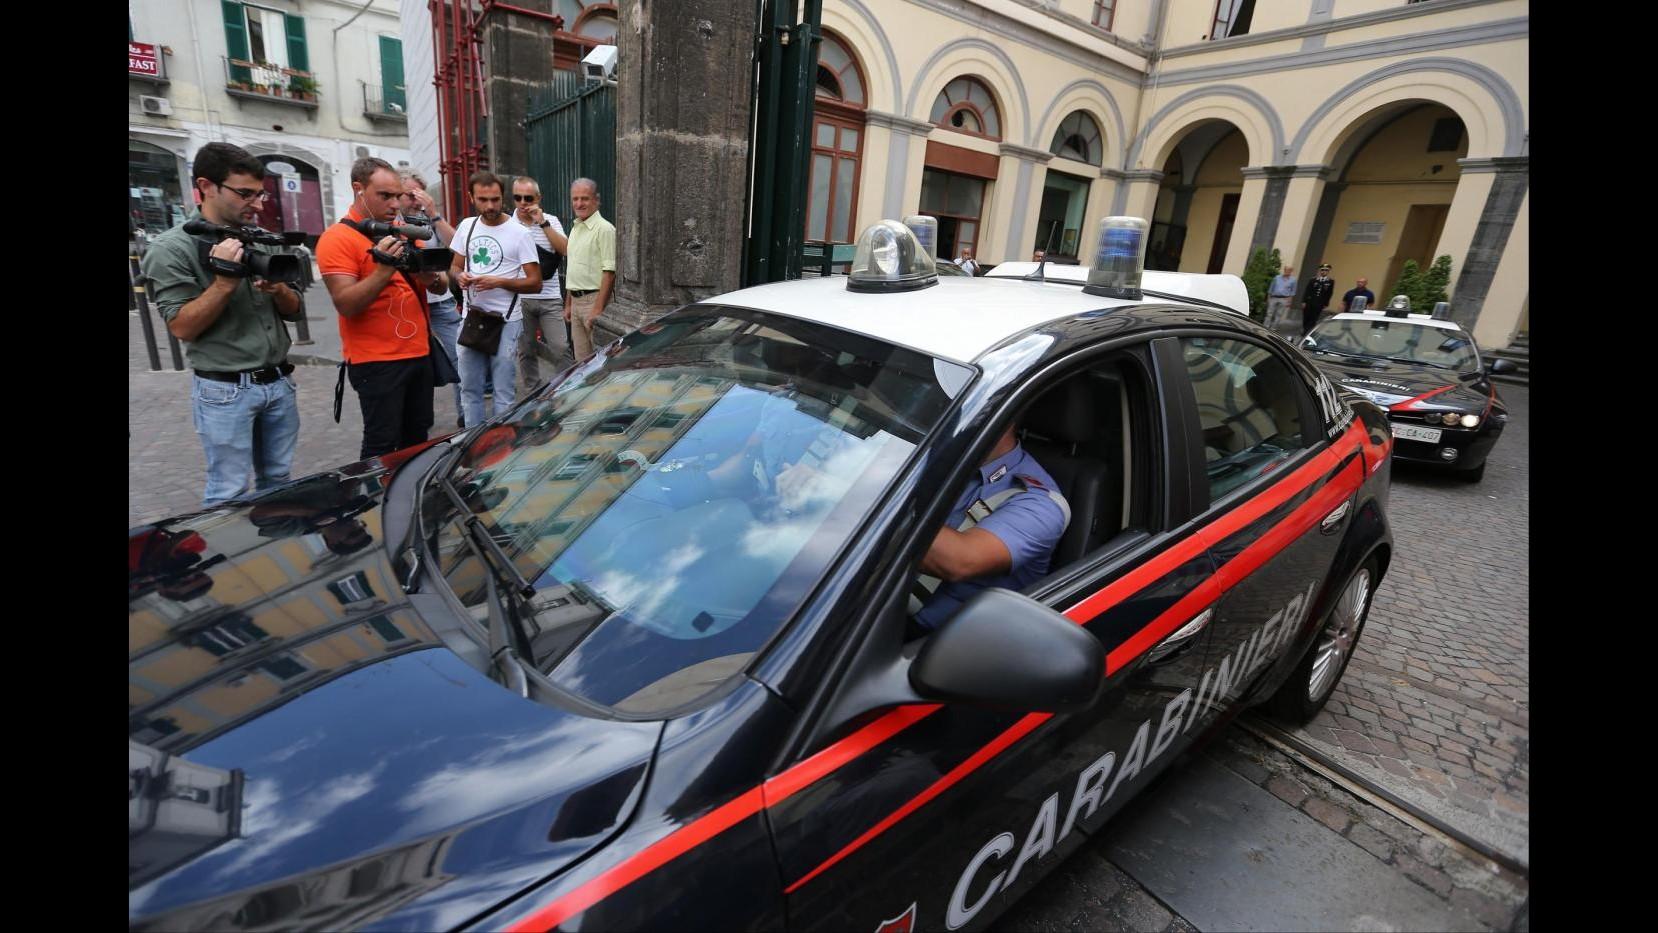 Bari, trasporta nel furgone 100 kg di marijuana: arrestato